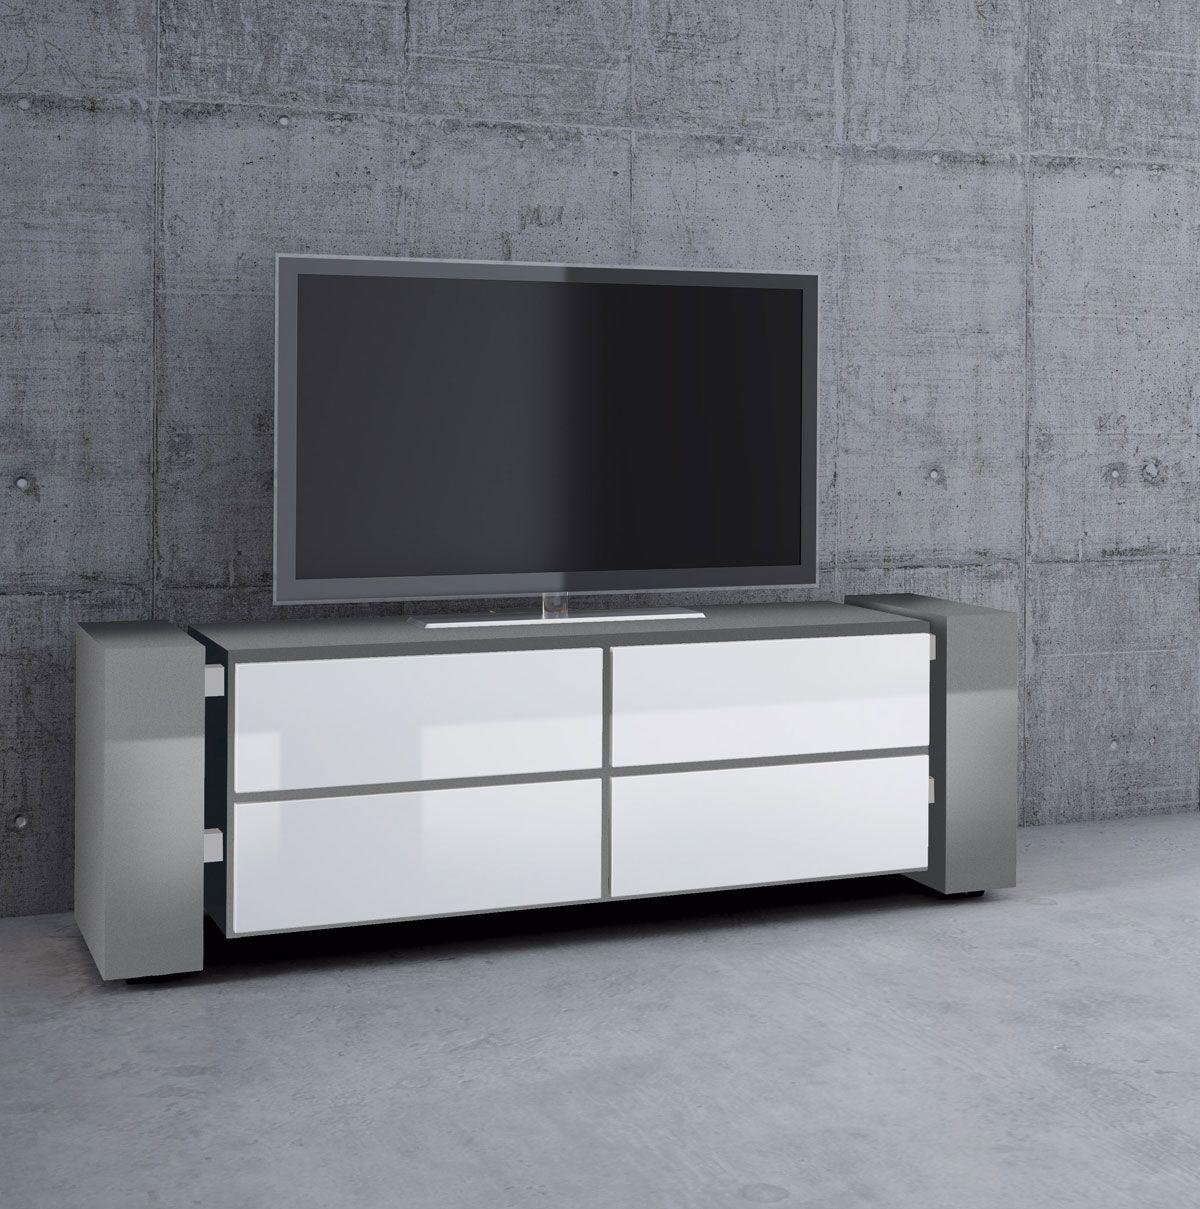 hifi design möbel stockfotos bild und ccfdddcfabfec jpg